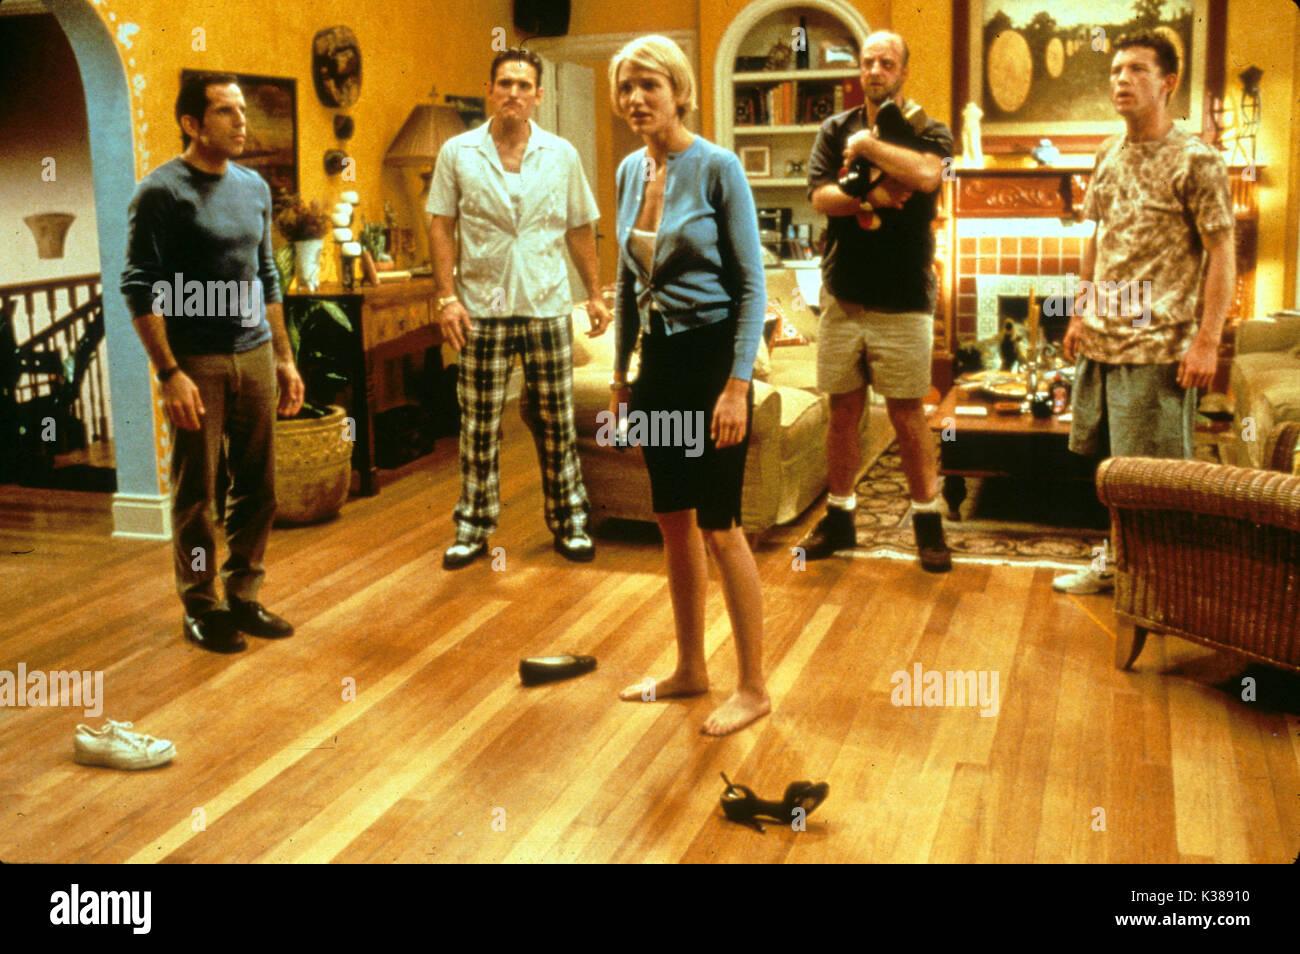 THERE'S SOMETHING ABOUT MARY (US 1998) C20TH FOX BEN STILLER, MATT DILLON, CAMERON DIAZ, CHRIS ELLIOTT, LEE EVANS     Date: 1998 - Stock Image